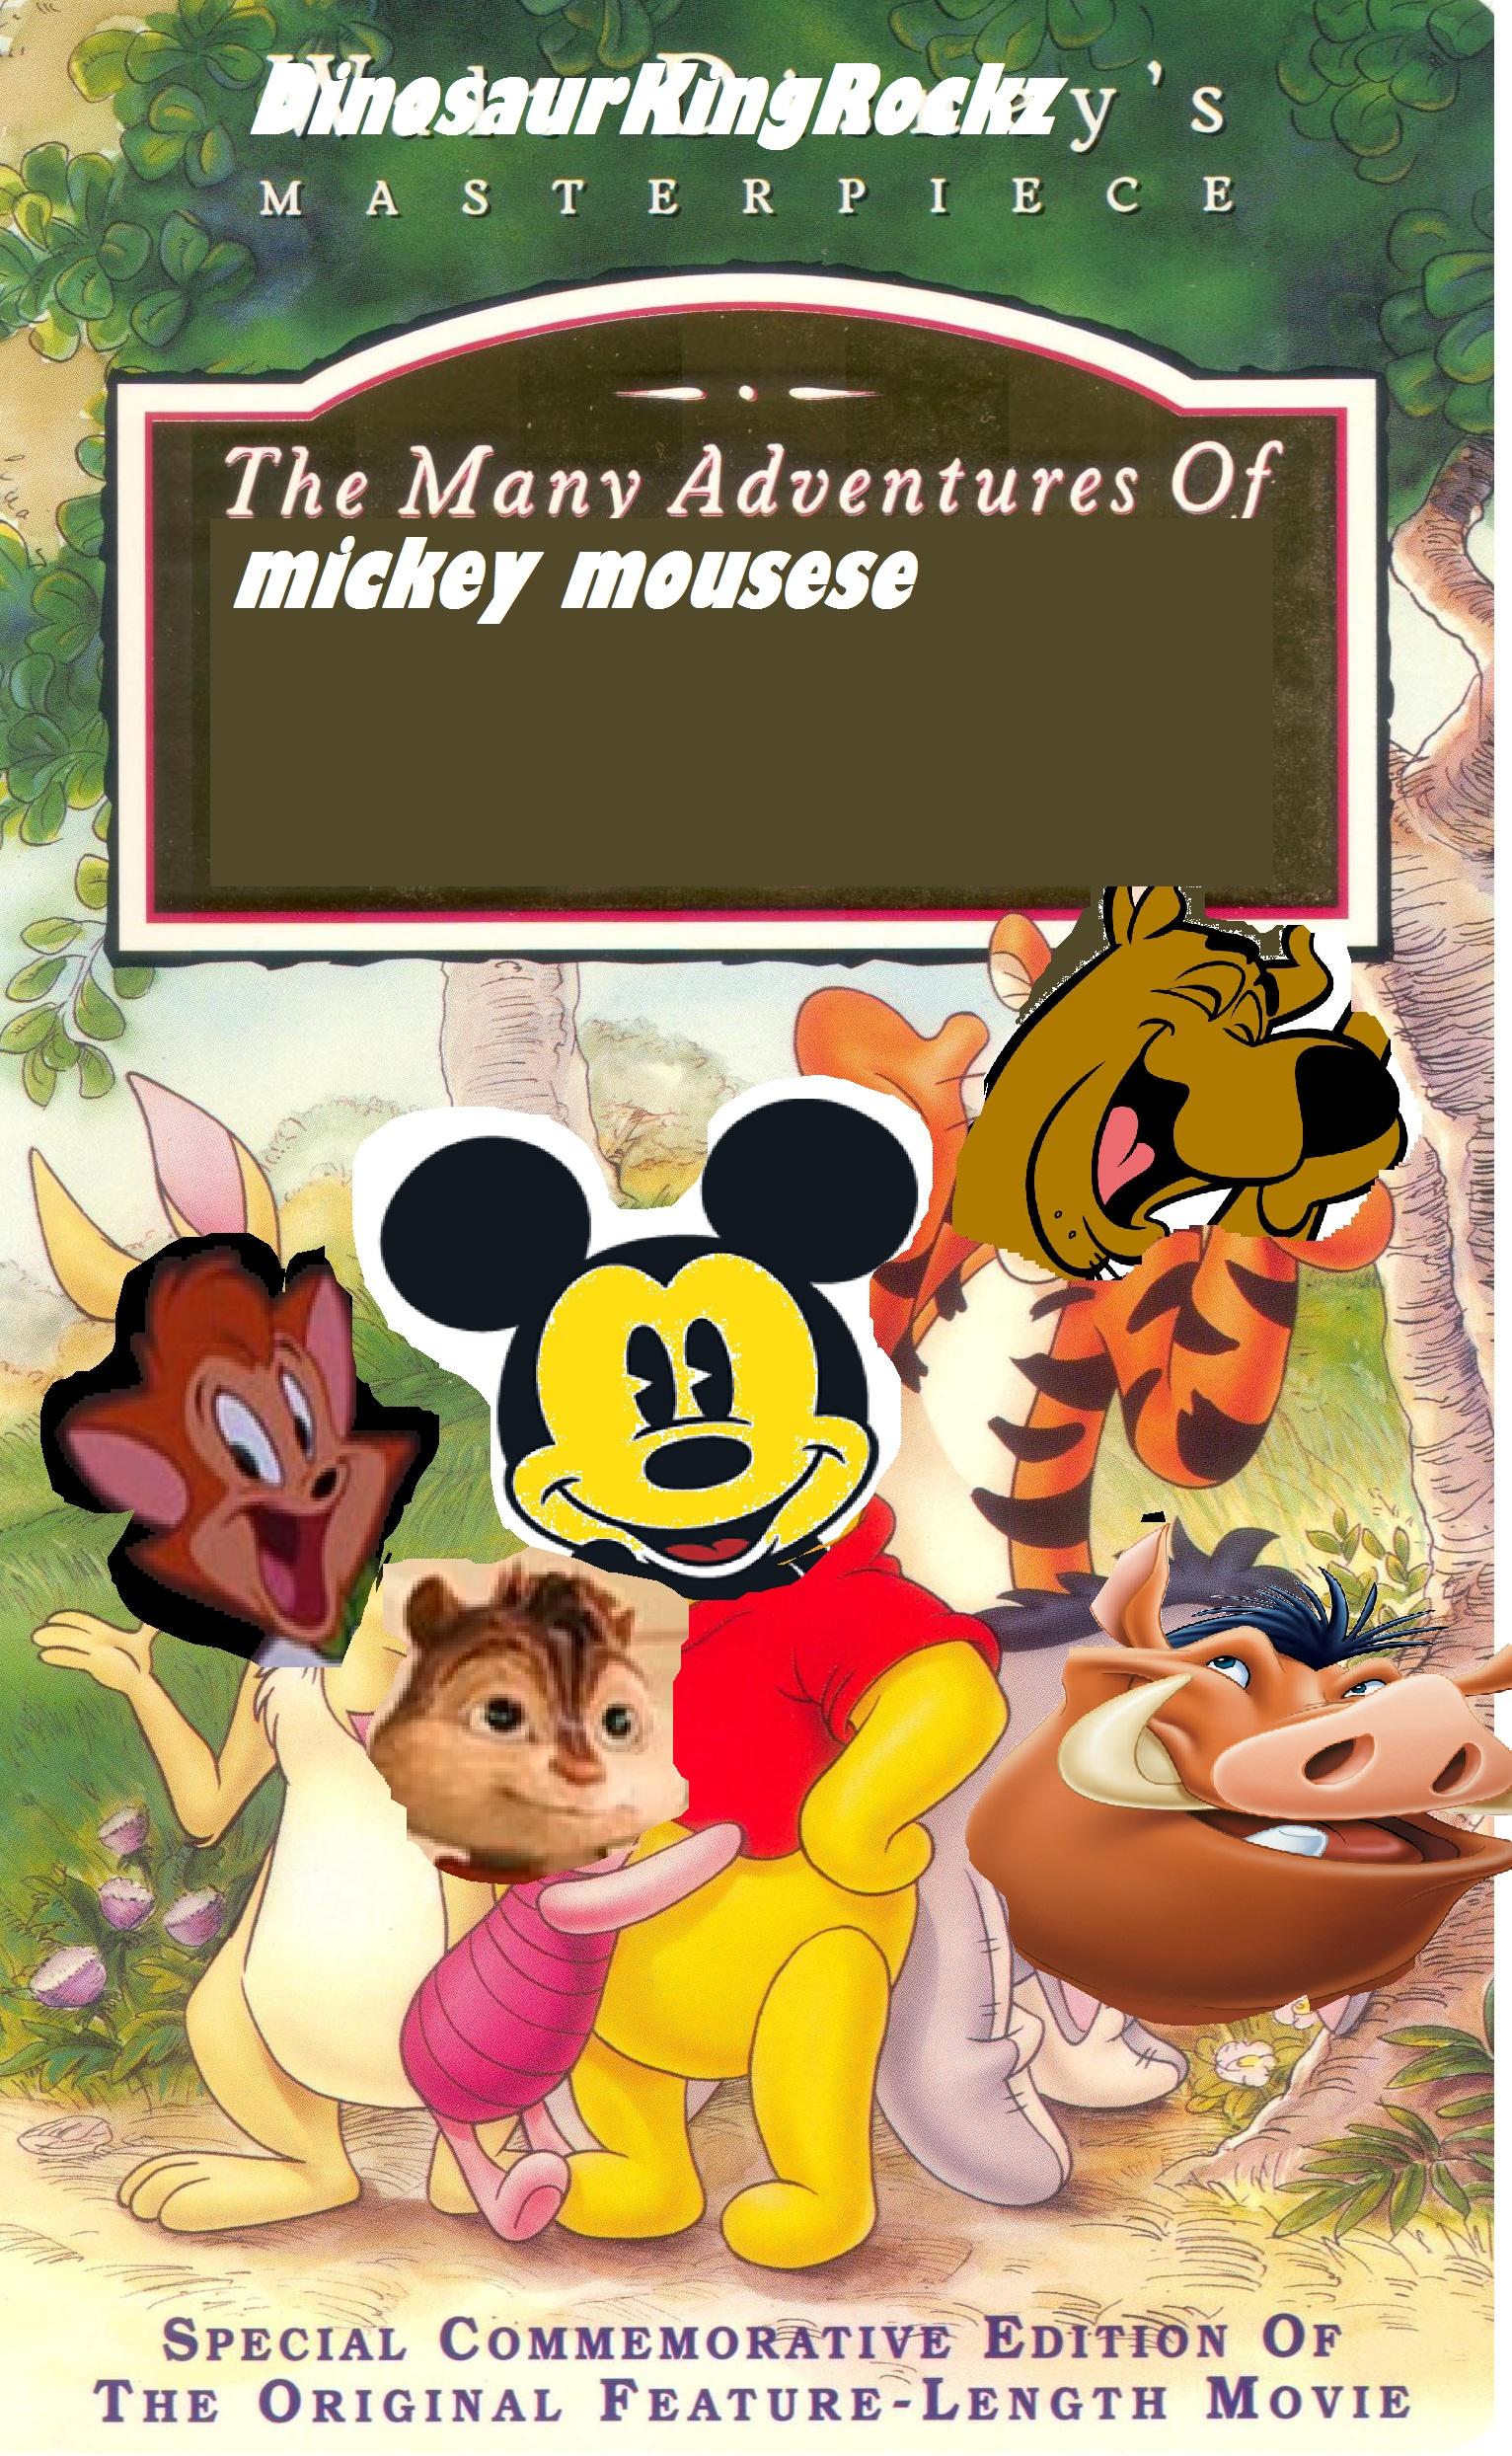 The Many Faces Of Sicily Dolce Gabbana Sicilian Folk: The Many Adventures Of Mickey Mouse (DinosaurKingRockz